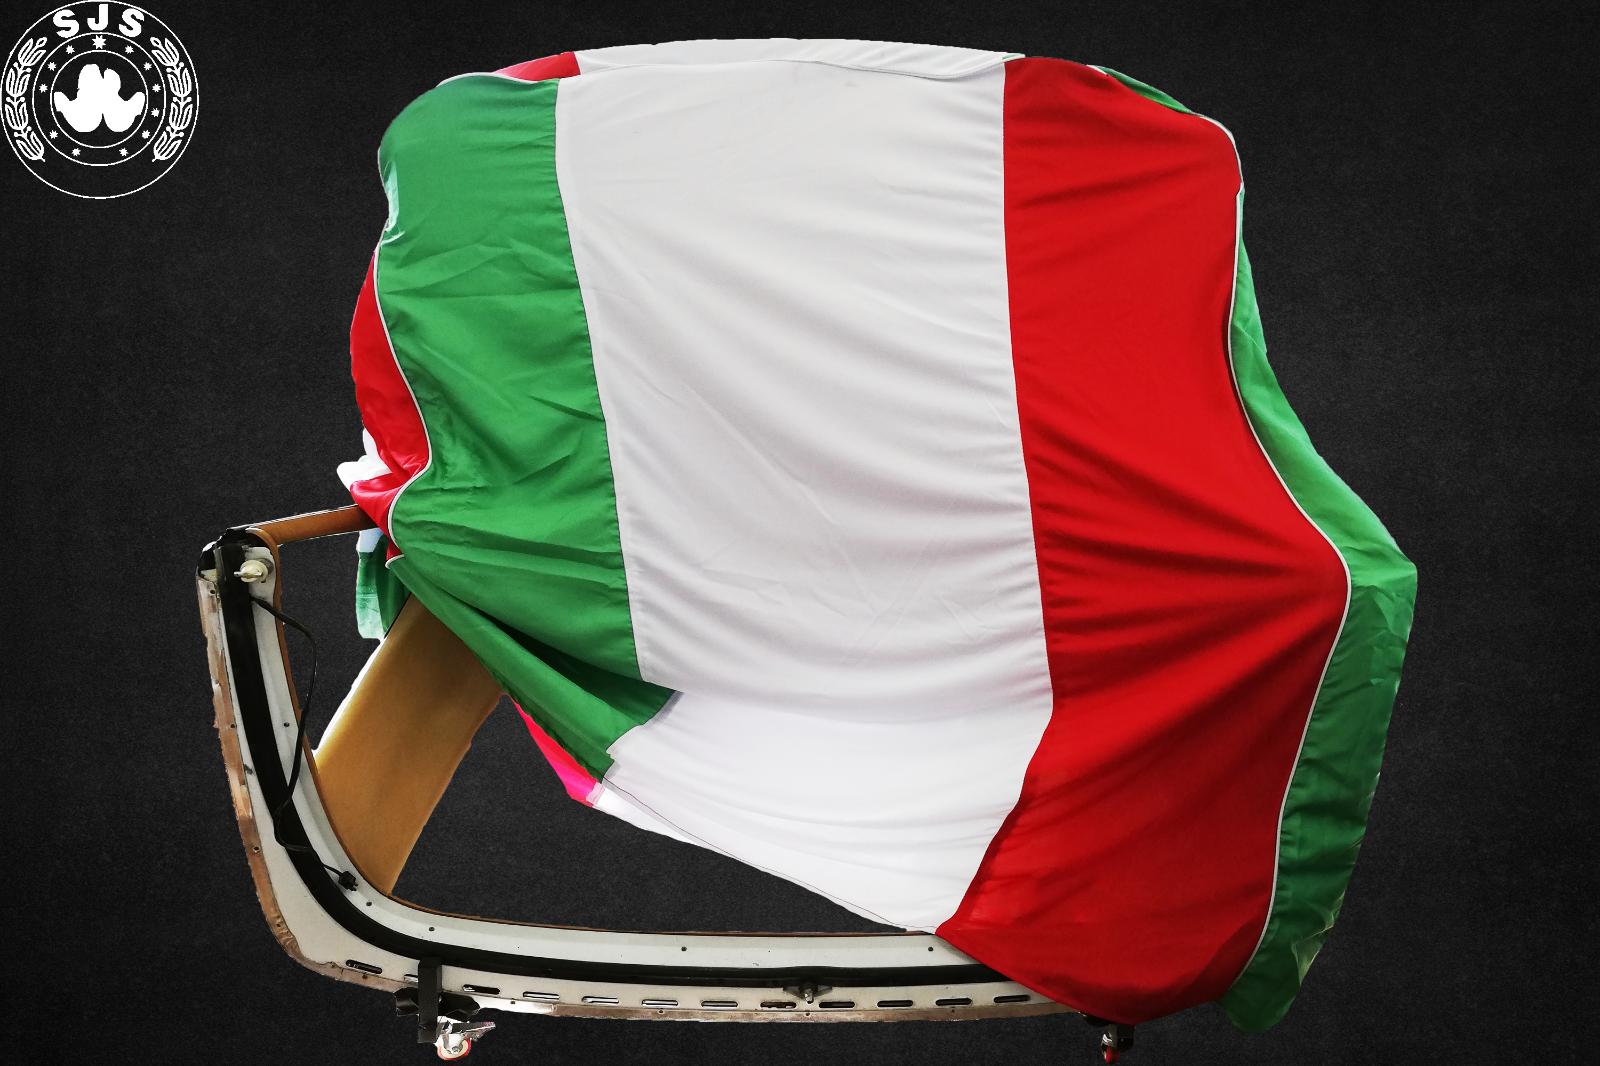 Hardtopcover Staubschutzhülle cover Italienflagge für Mercedes SL W113 Pagode